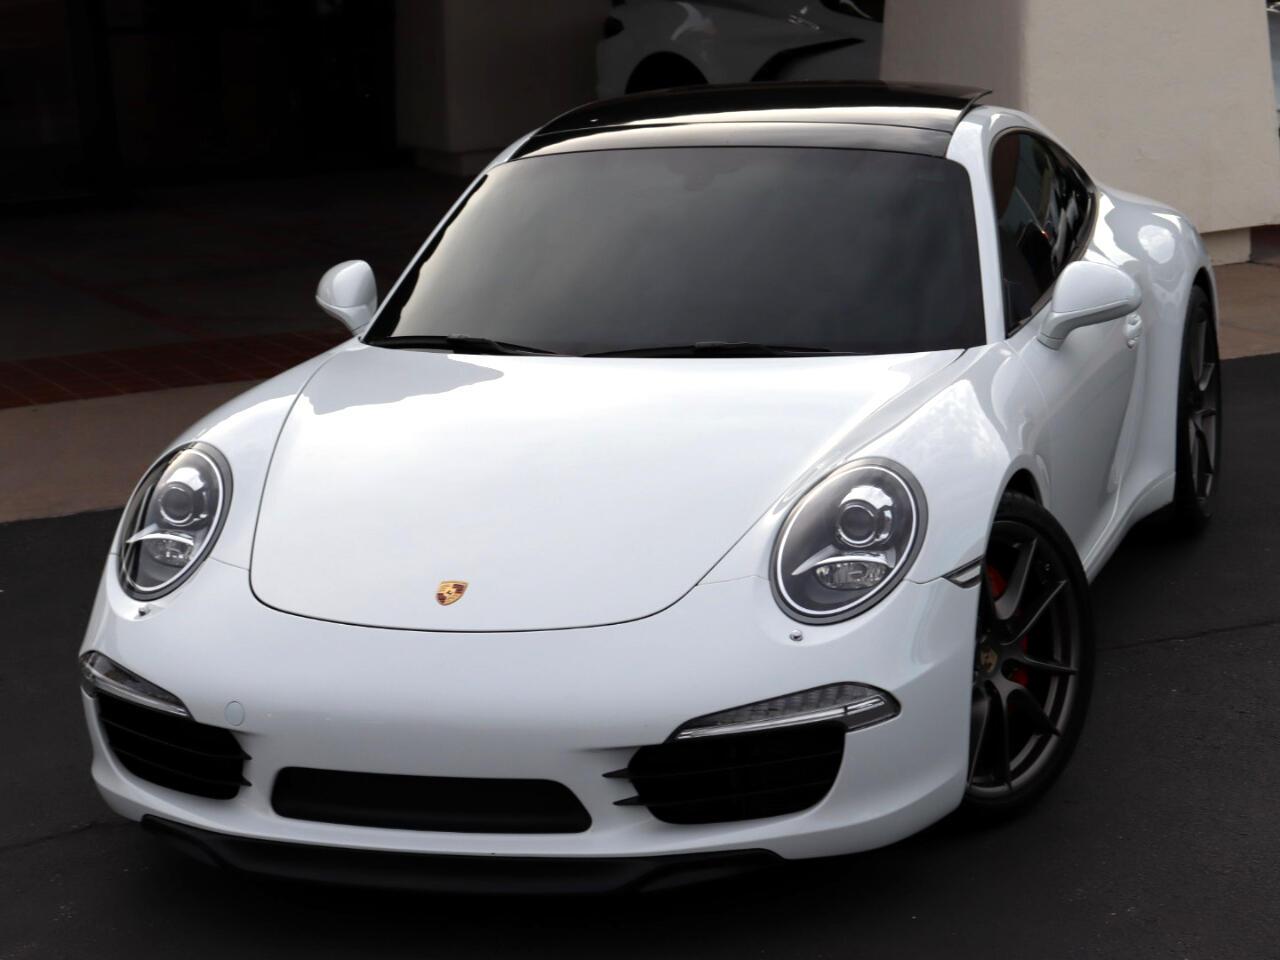 Porsche 911 Carrera S Coupe 2013